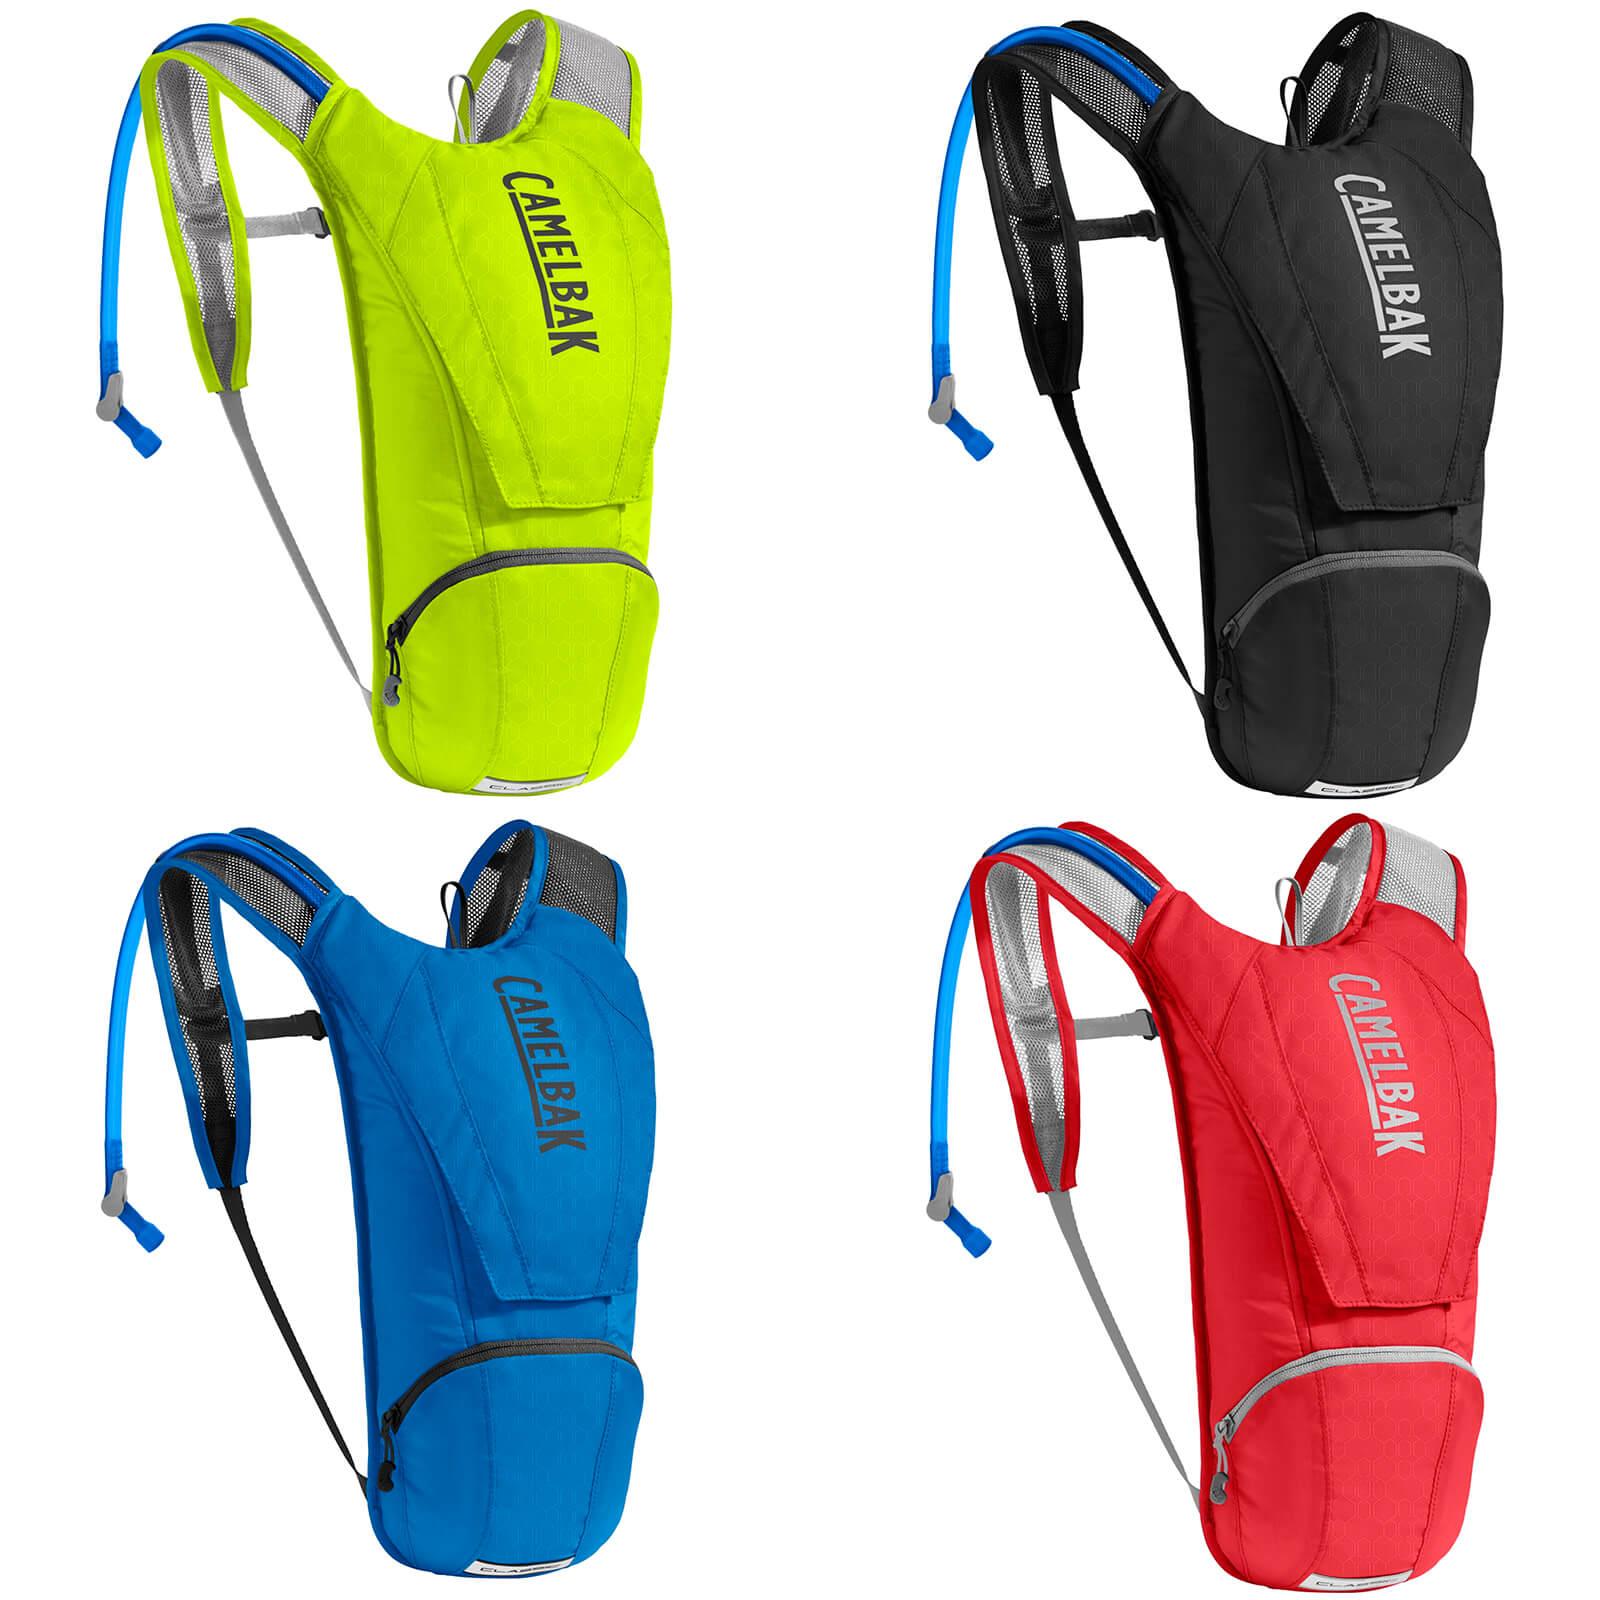 f8f7f0de14d Camelbak Classic Hydration Backpack 2.5 Litres | ProBikeKit Canada